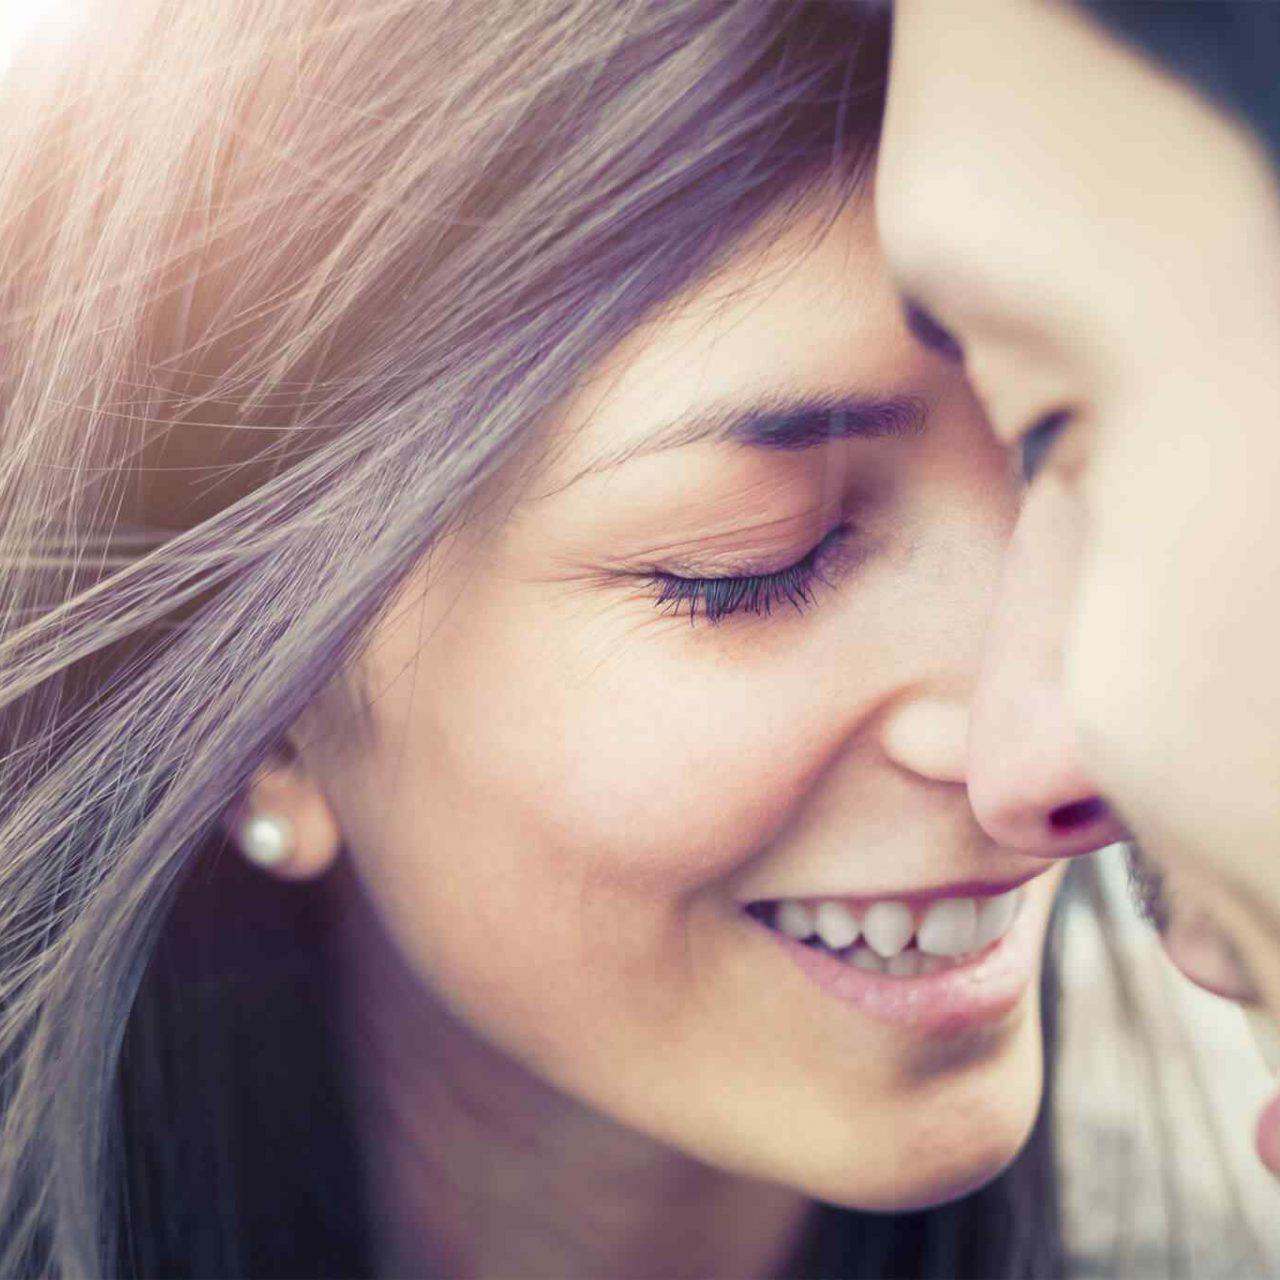 https://www.prepared.sarl/wp-content/uploads/2018/01/img-class-marriage-01-1280x1280.jpg